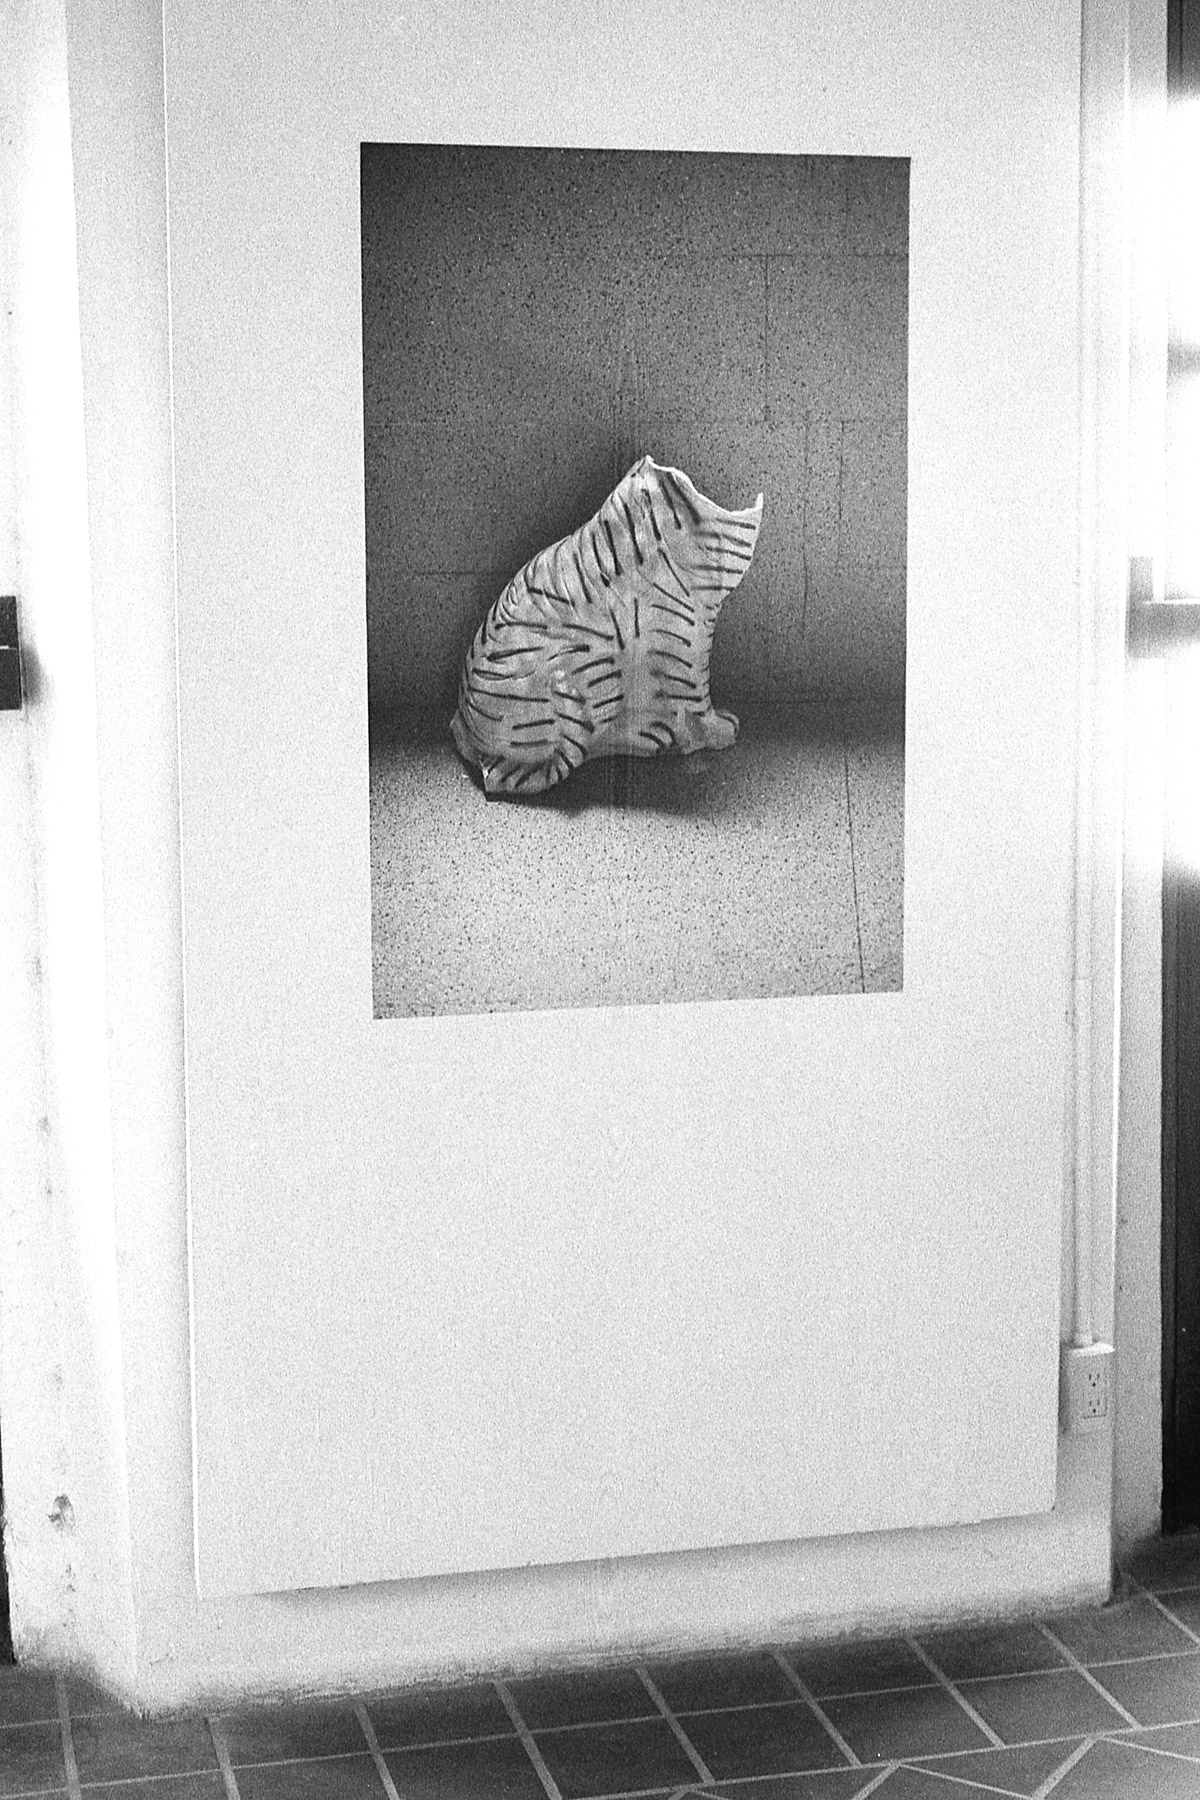 S/T, Impresión en papel tapiz, 120 x 80 cm.